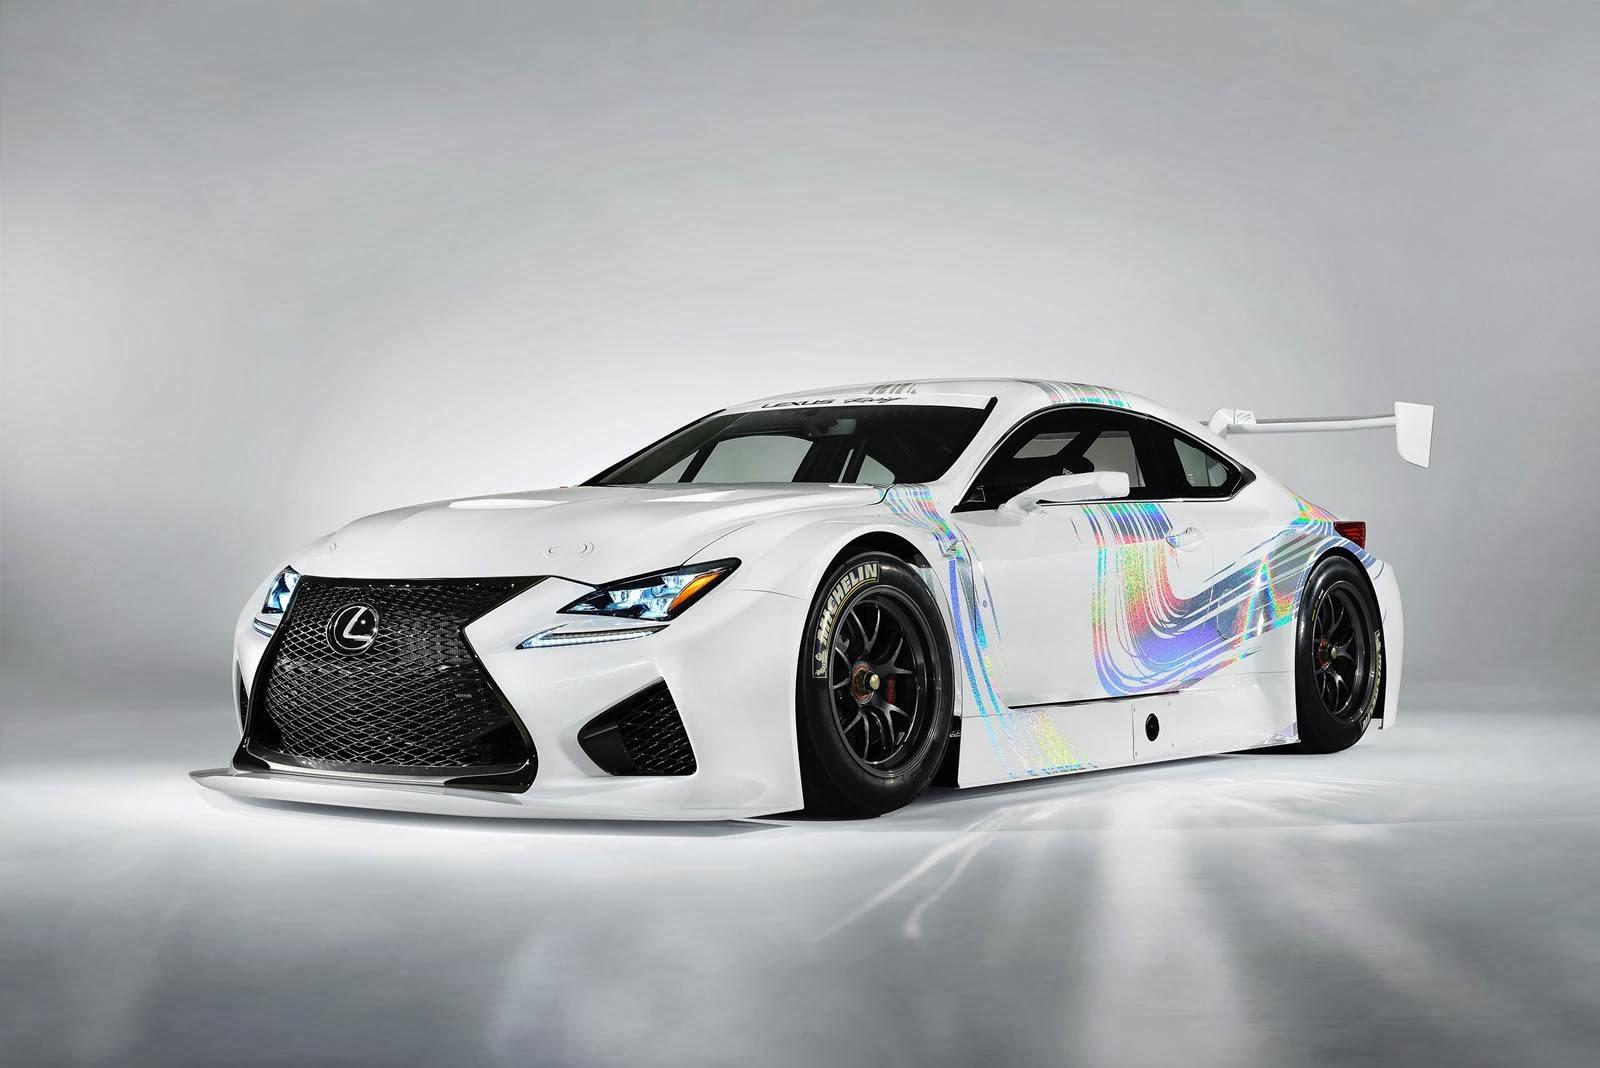 [Resim: Lexus+RC+F+GT3+1.jpg]